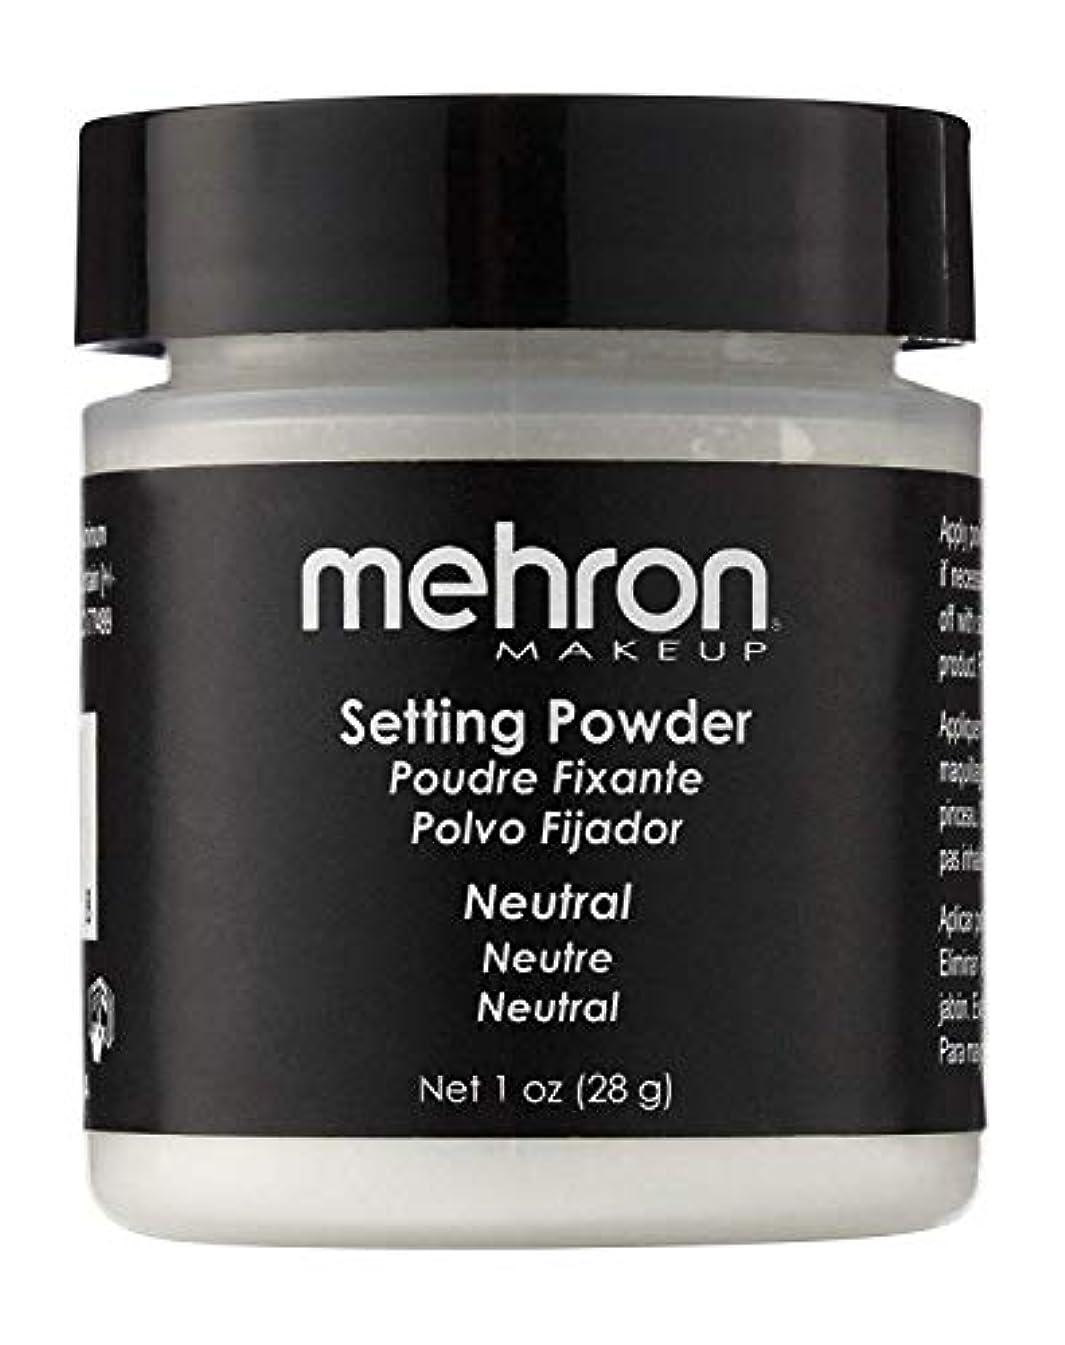 敵博覧会牽引mehron UltraFine Setting Powder with Anti Perspriant Neutral (並行輸入品)